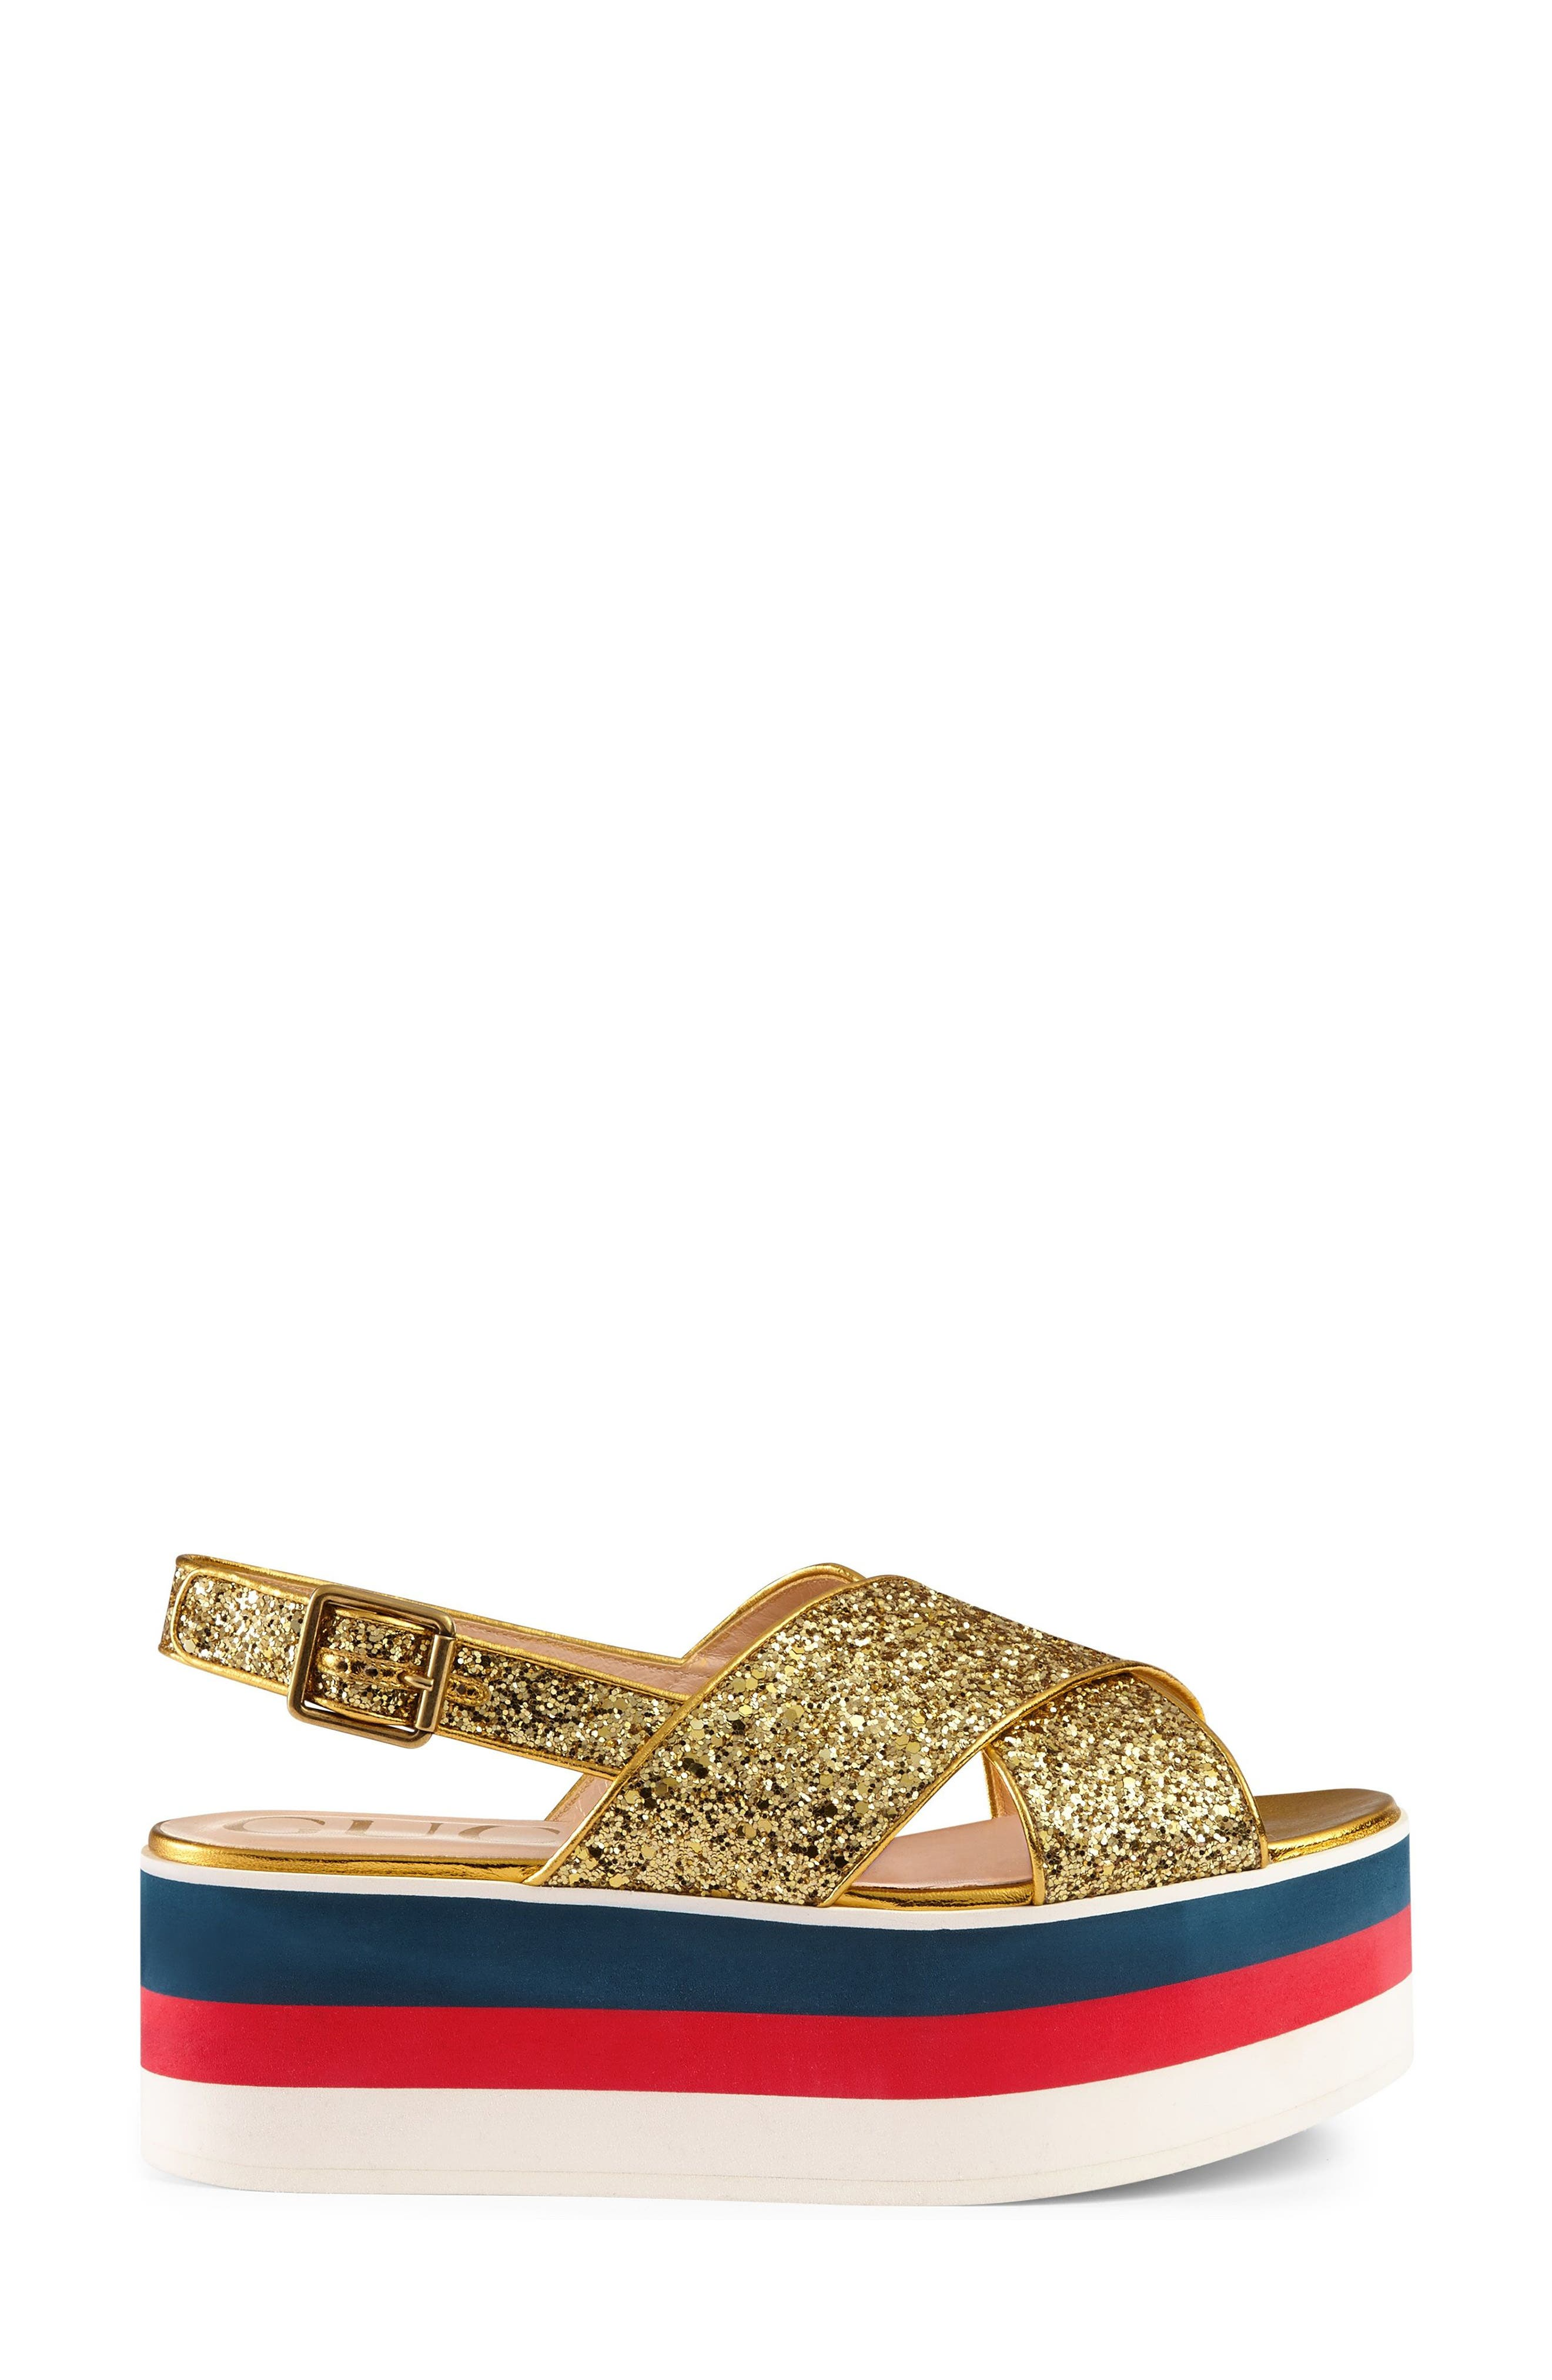 GUCCI Glitter Flatform Sandal